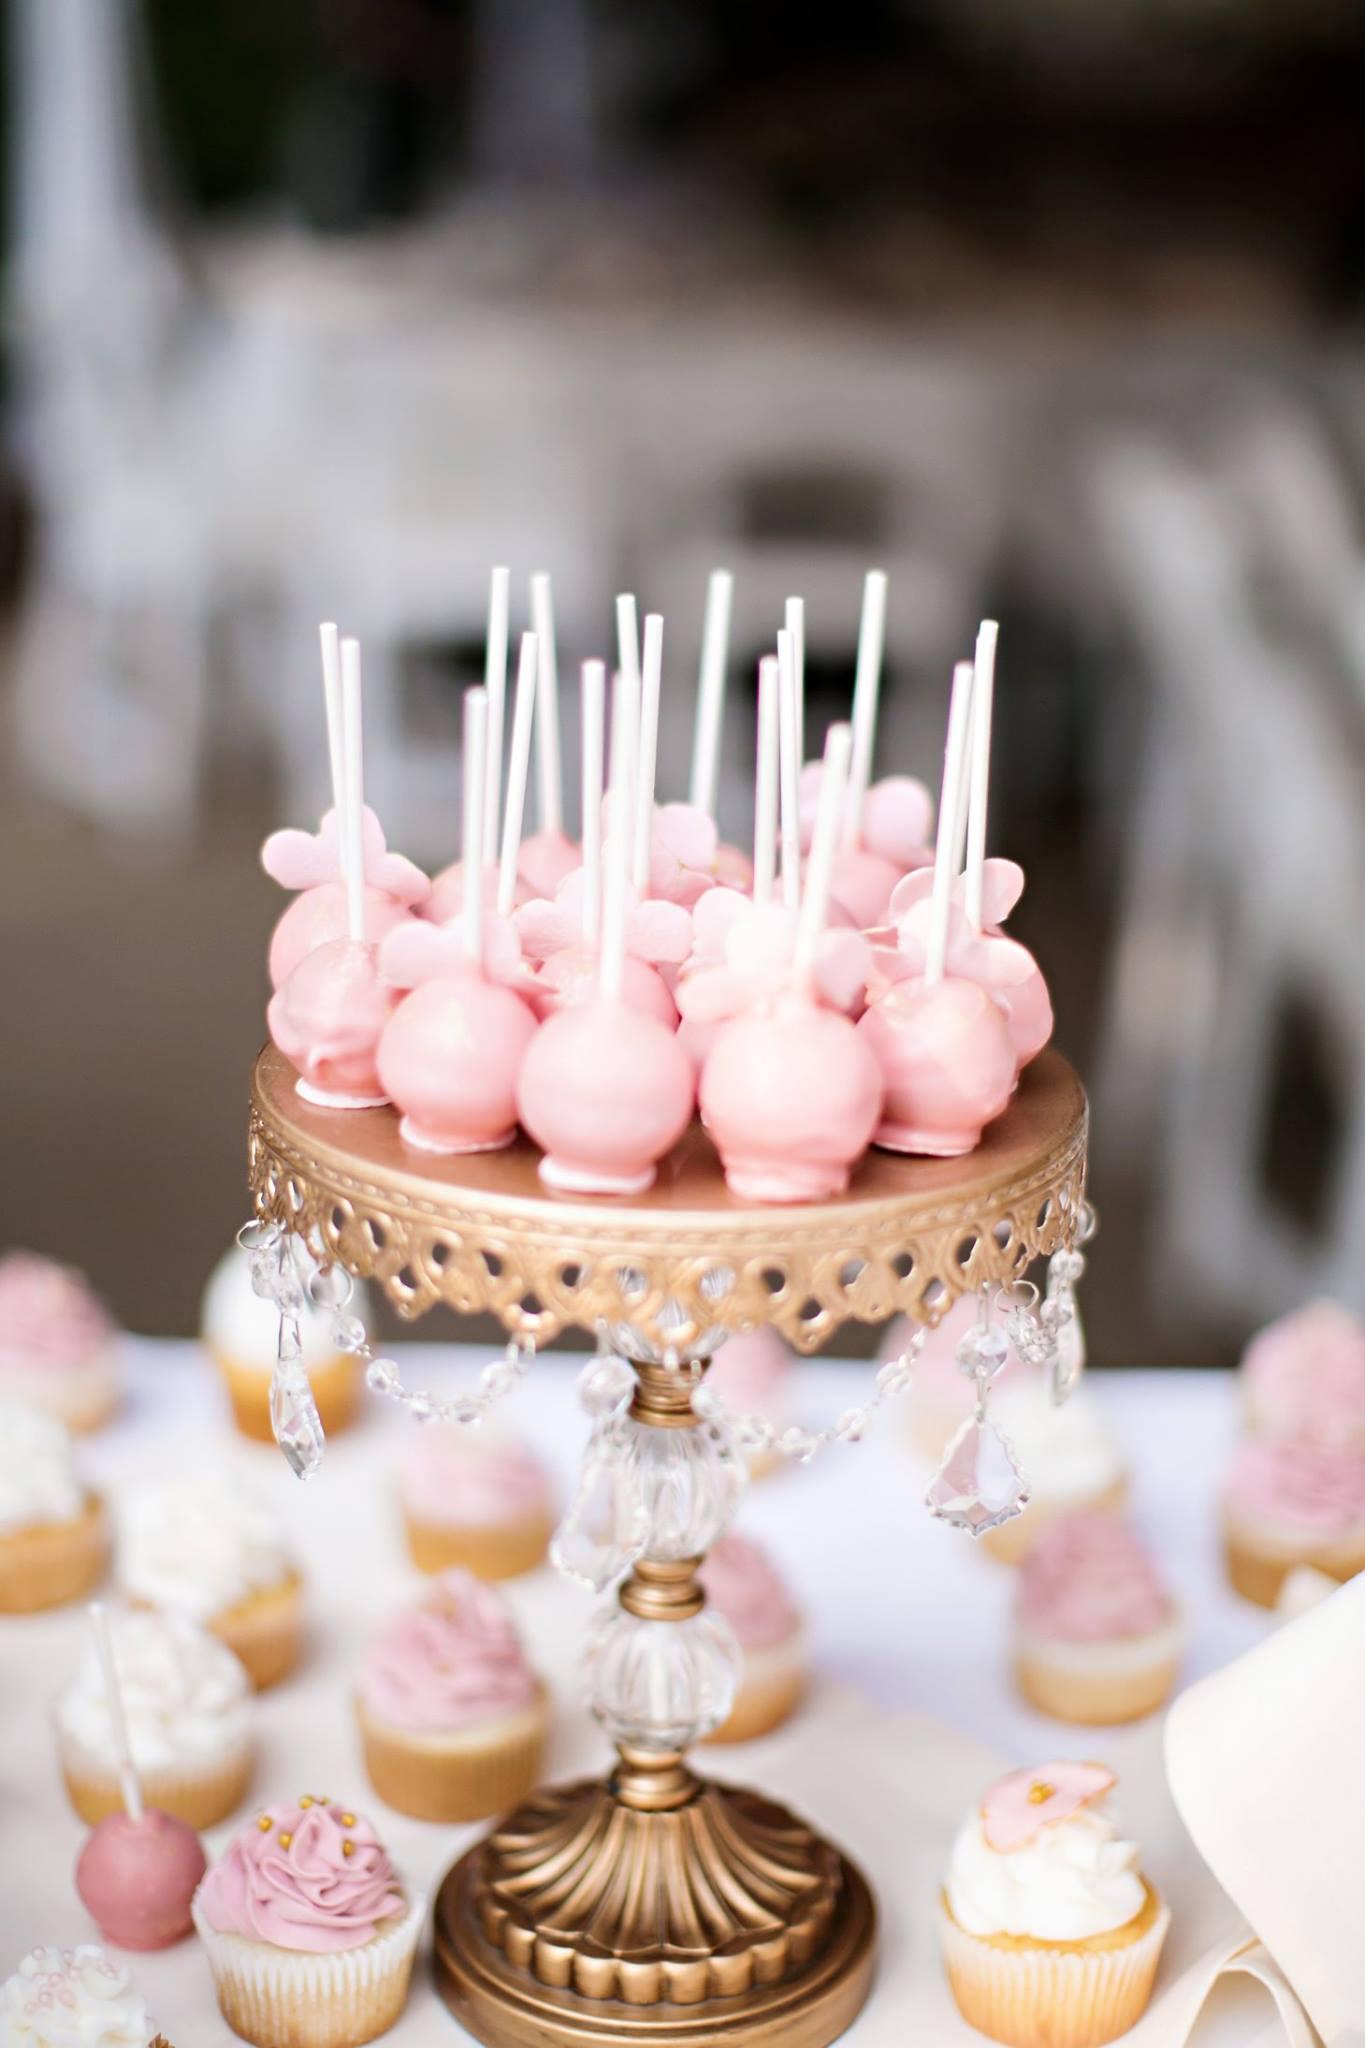 cakepops by cakeonsundays.jpg